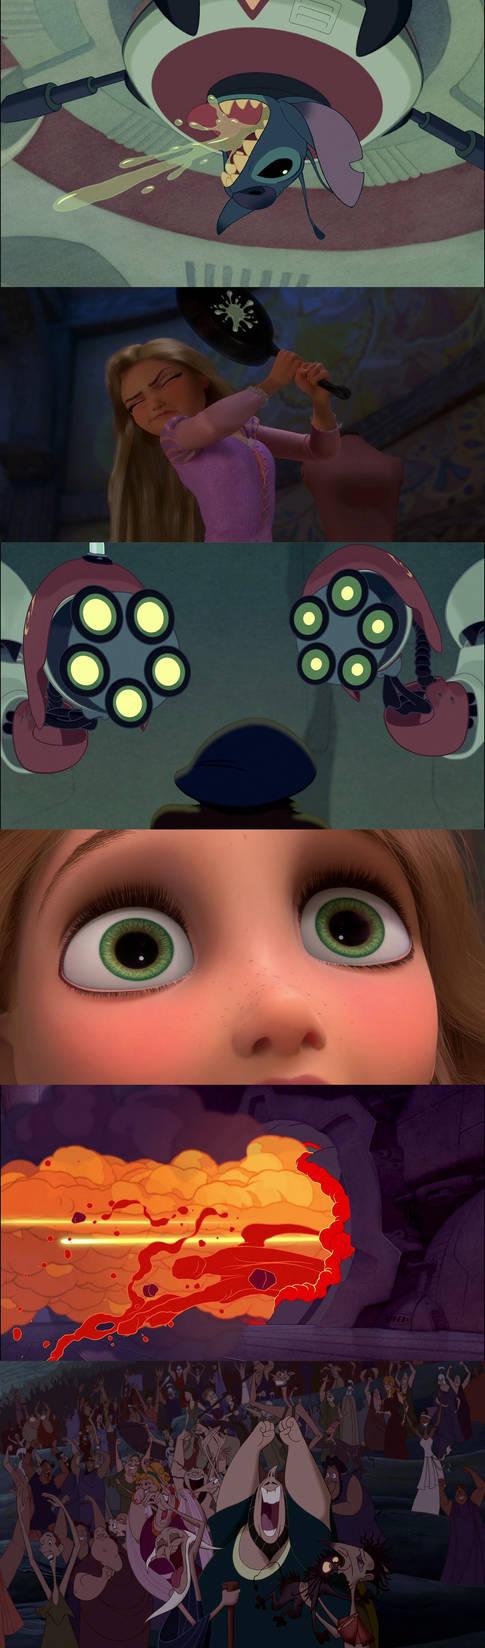 Stitch Blows Up Rapunzel